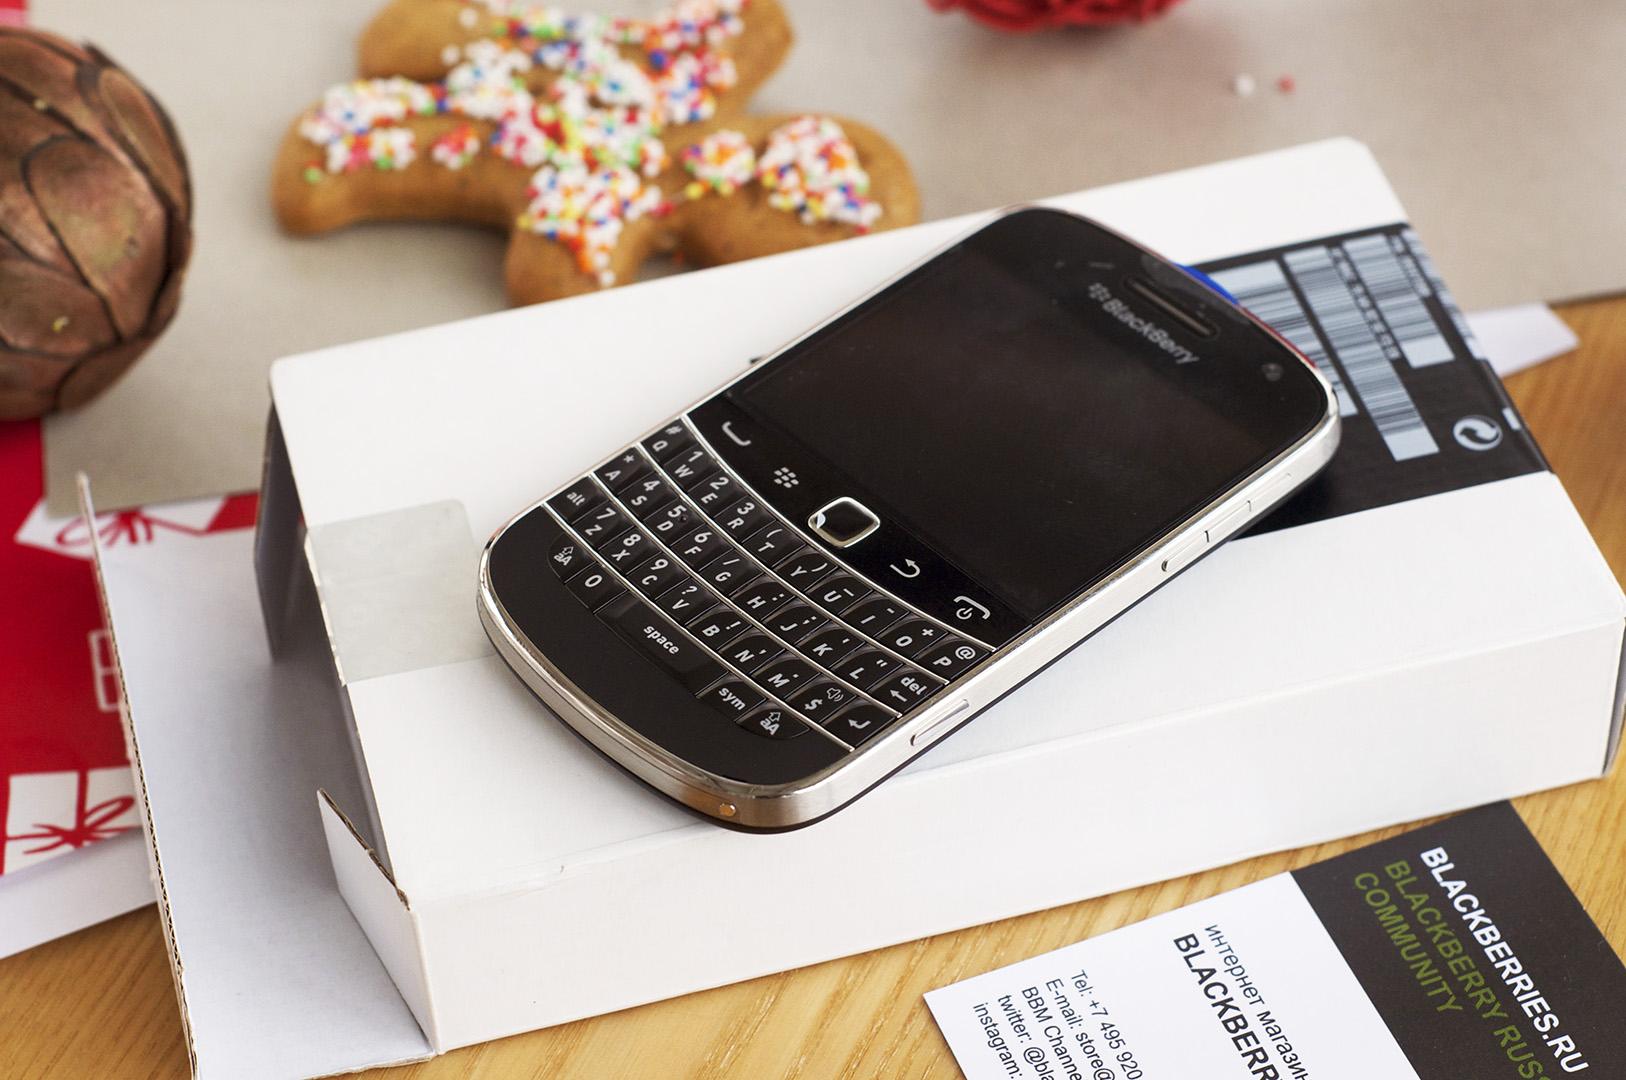 blackberry-9900-bold-2014-2